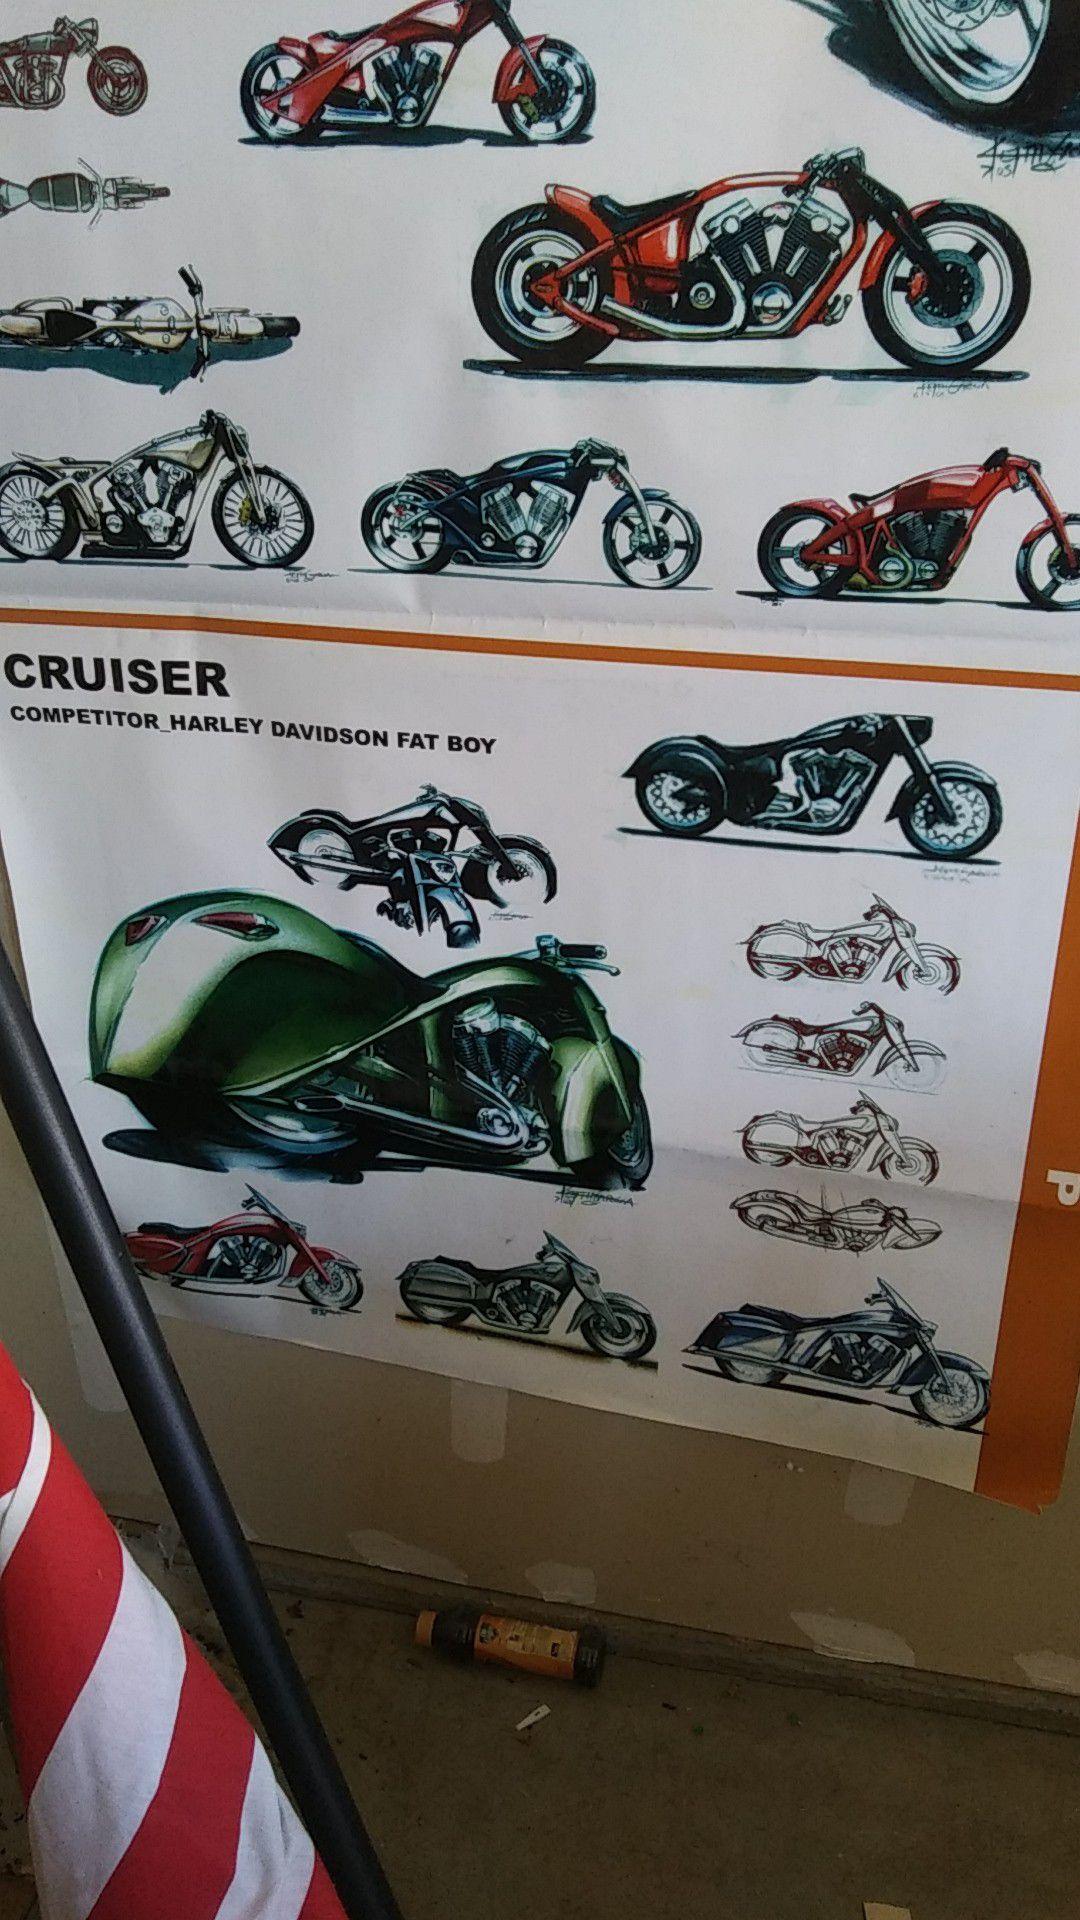 Harley-Davidson, Indian. Motorcycle poster